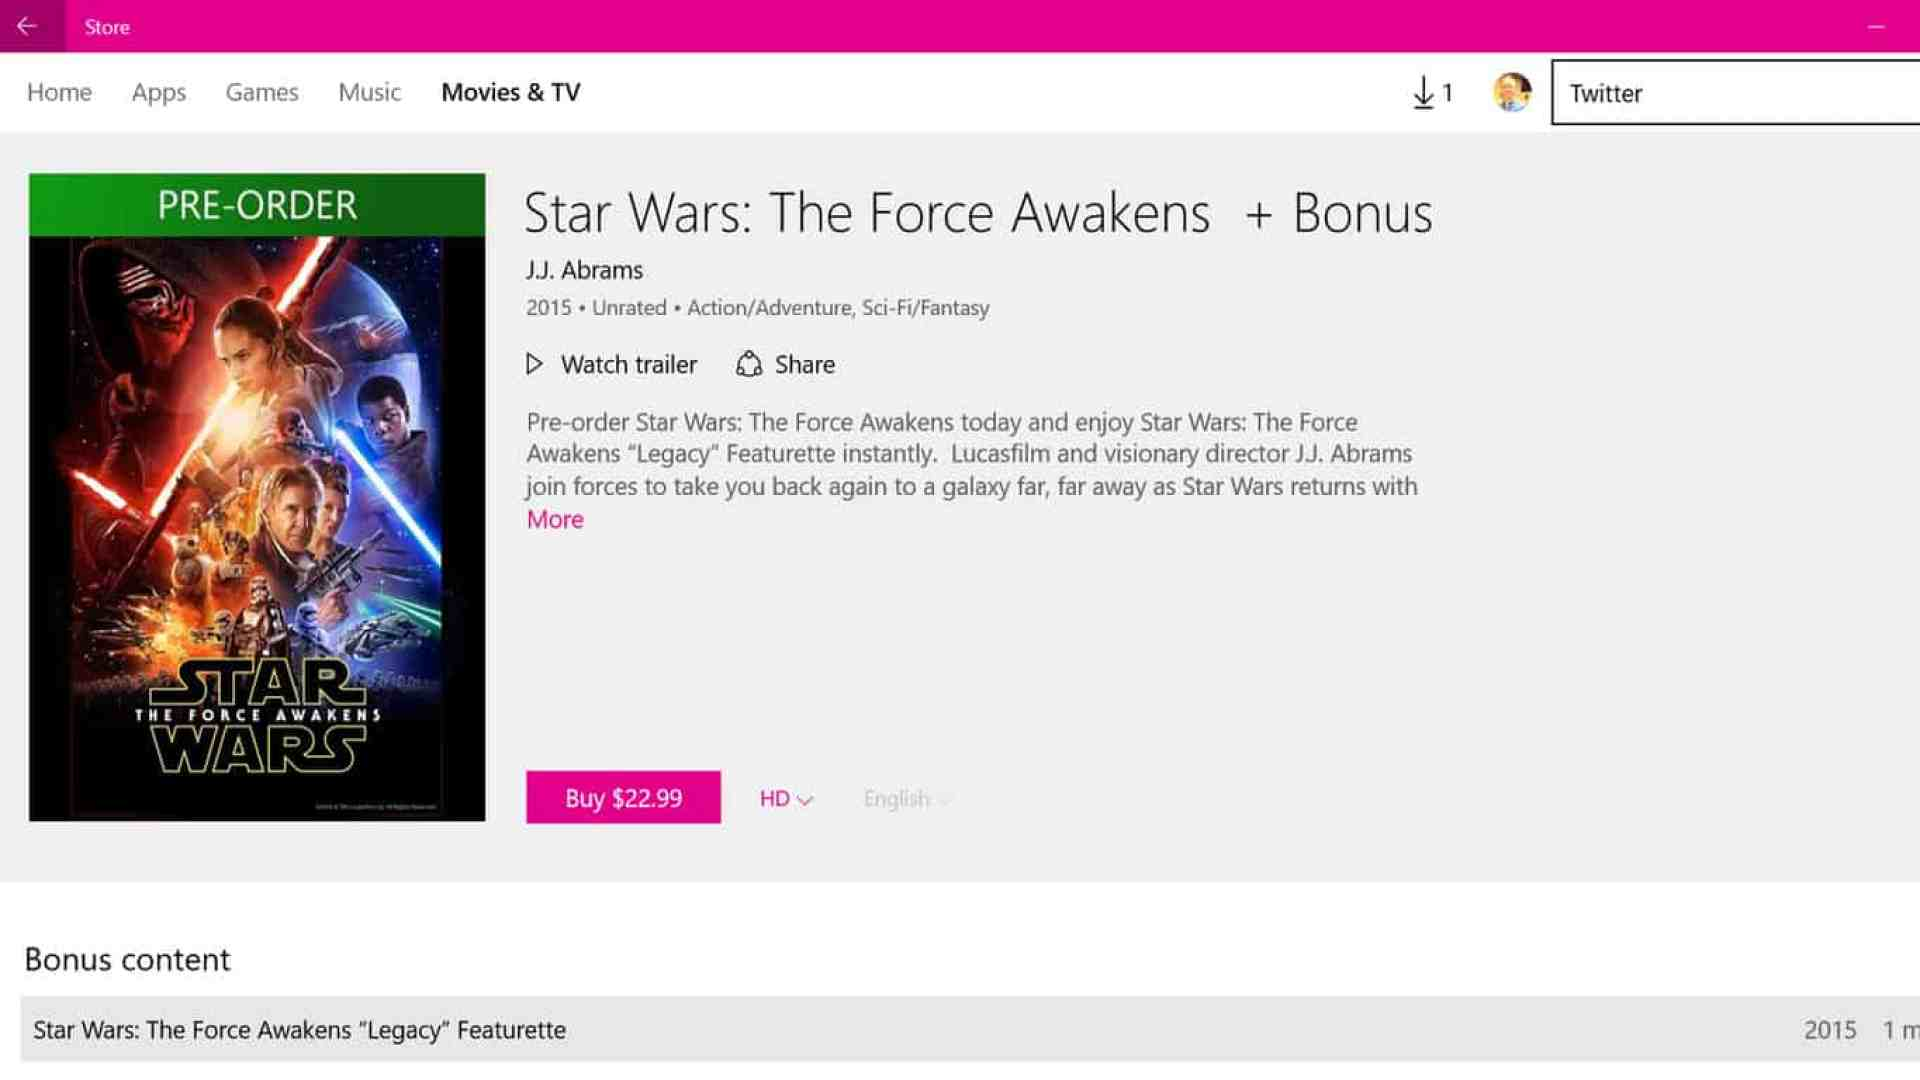 Star Wars: The Force Awakens in the Films & TV app on Windows 10